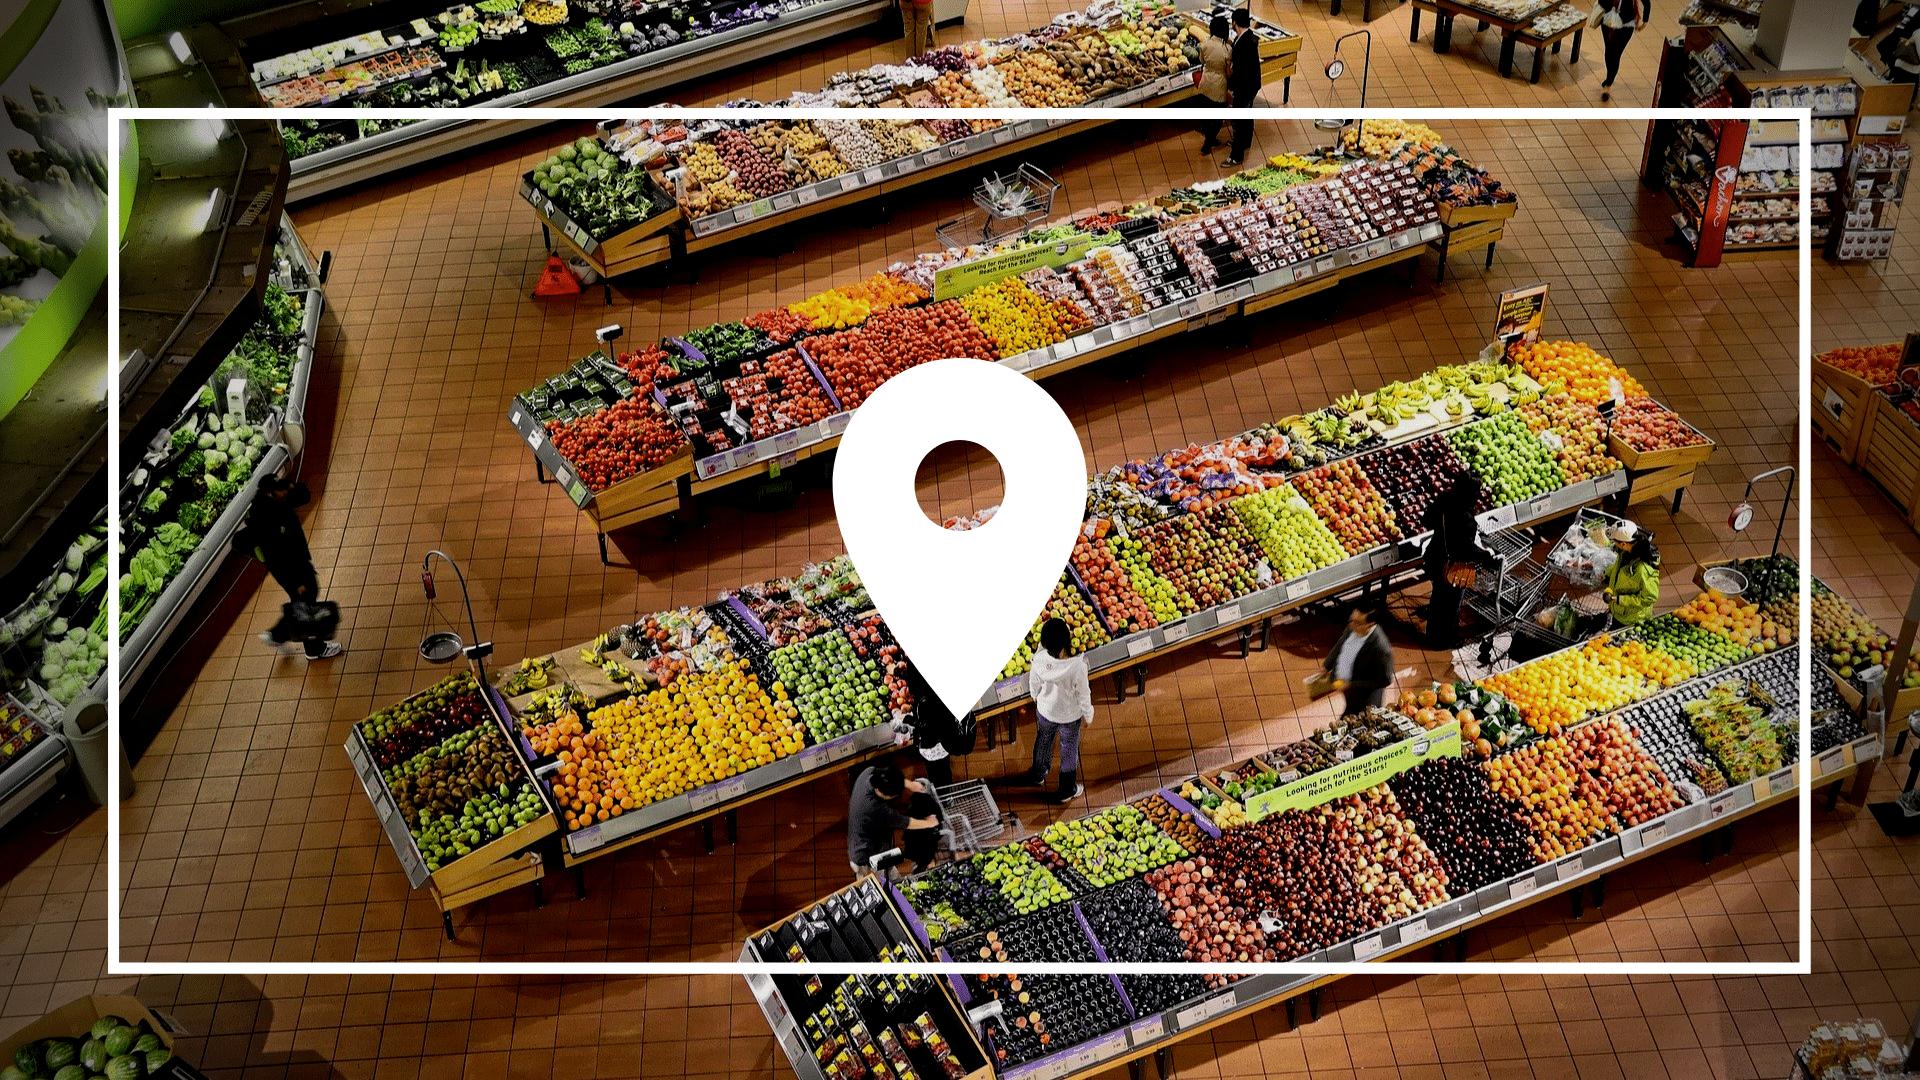 product-localization-icon-supermarket-background